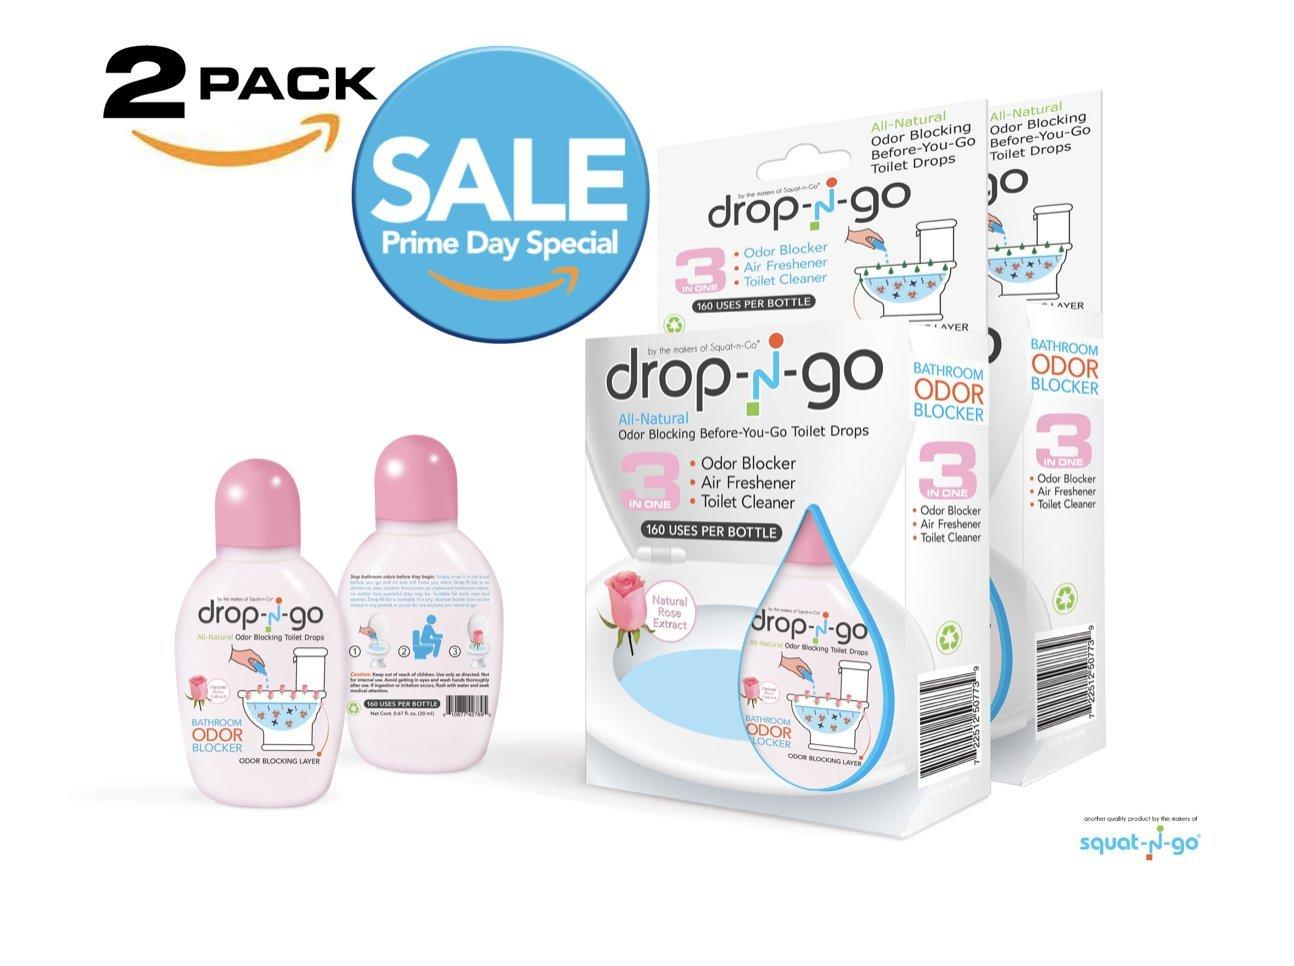 Drop-N-Go 3 in 1 : Ultimate All-Natural Bad Bathroom Odor Blocker, Air Freshener, Toilet Cleaner in Small & Discrete Bottle